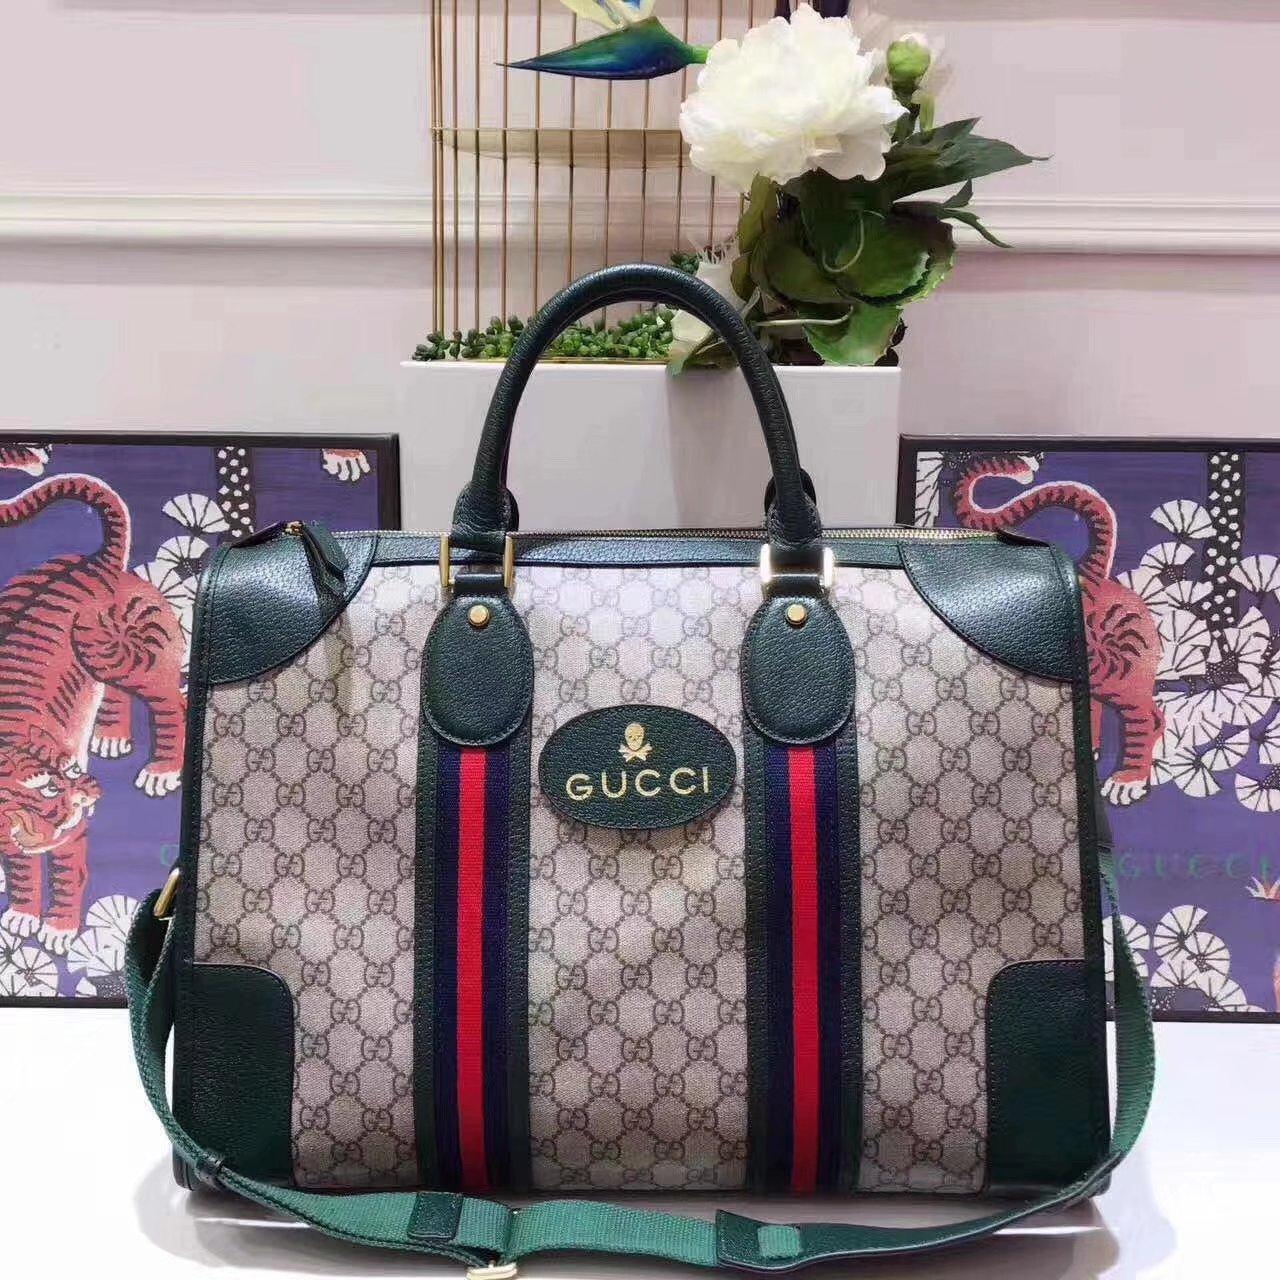 Original Quality Gucci 459311 Soft GG Supreme Duffle bag With Web